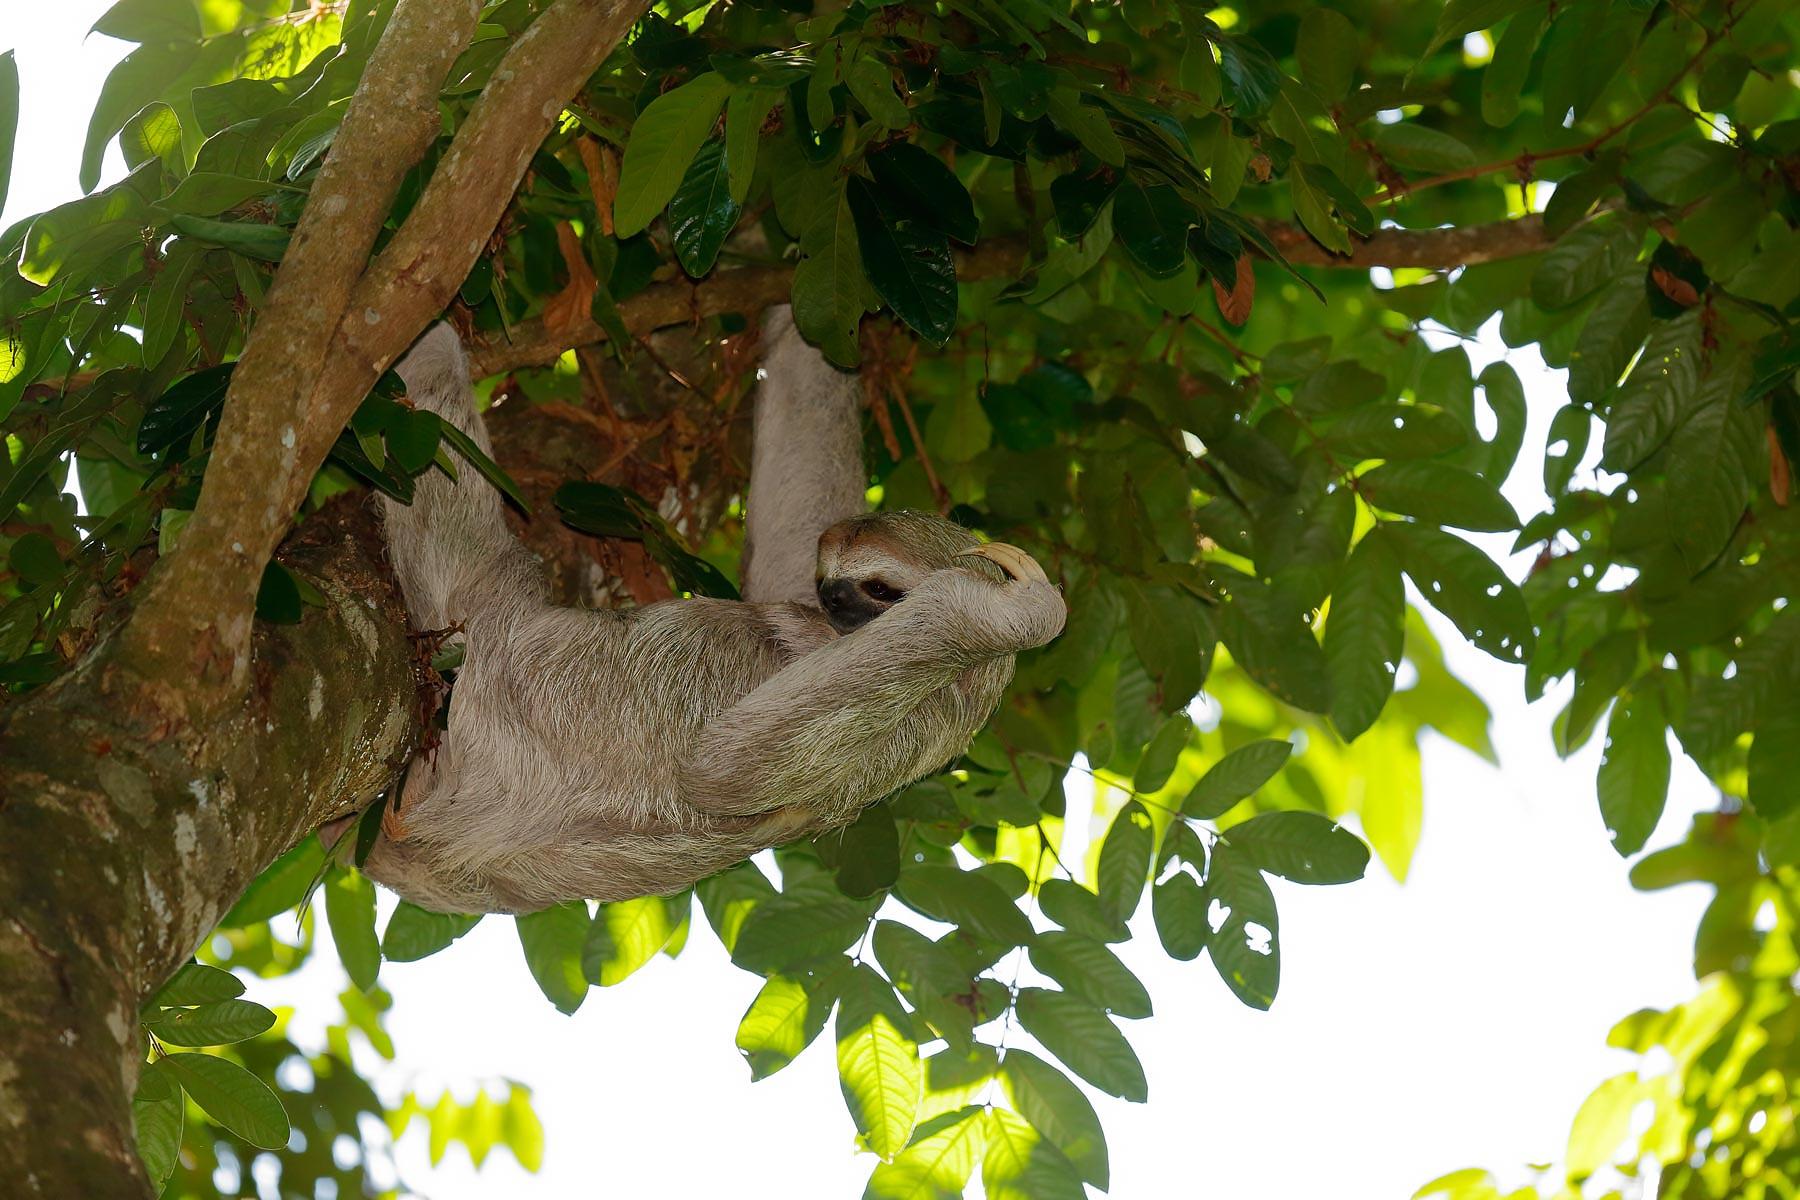 Sloth / Luiaard @ Costa Rica